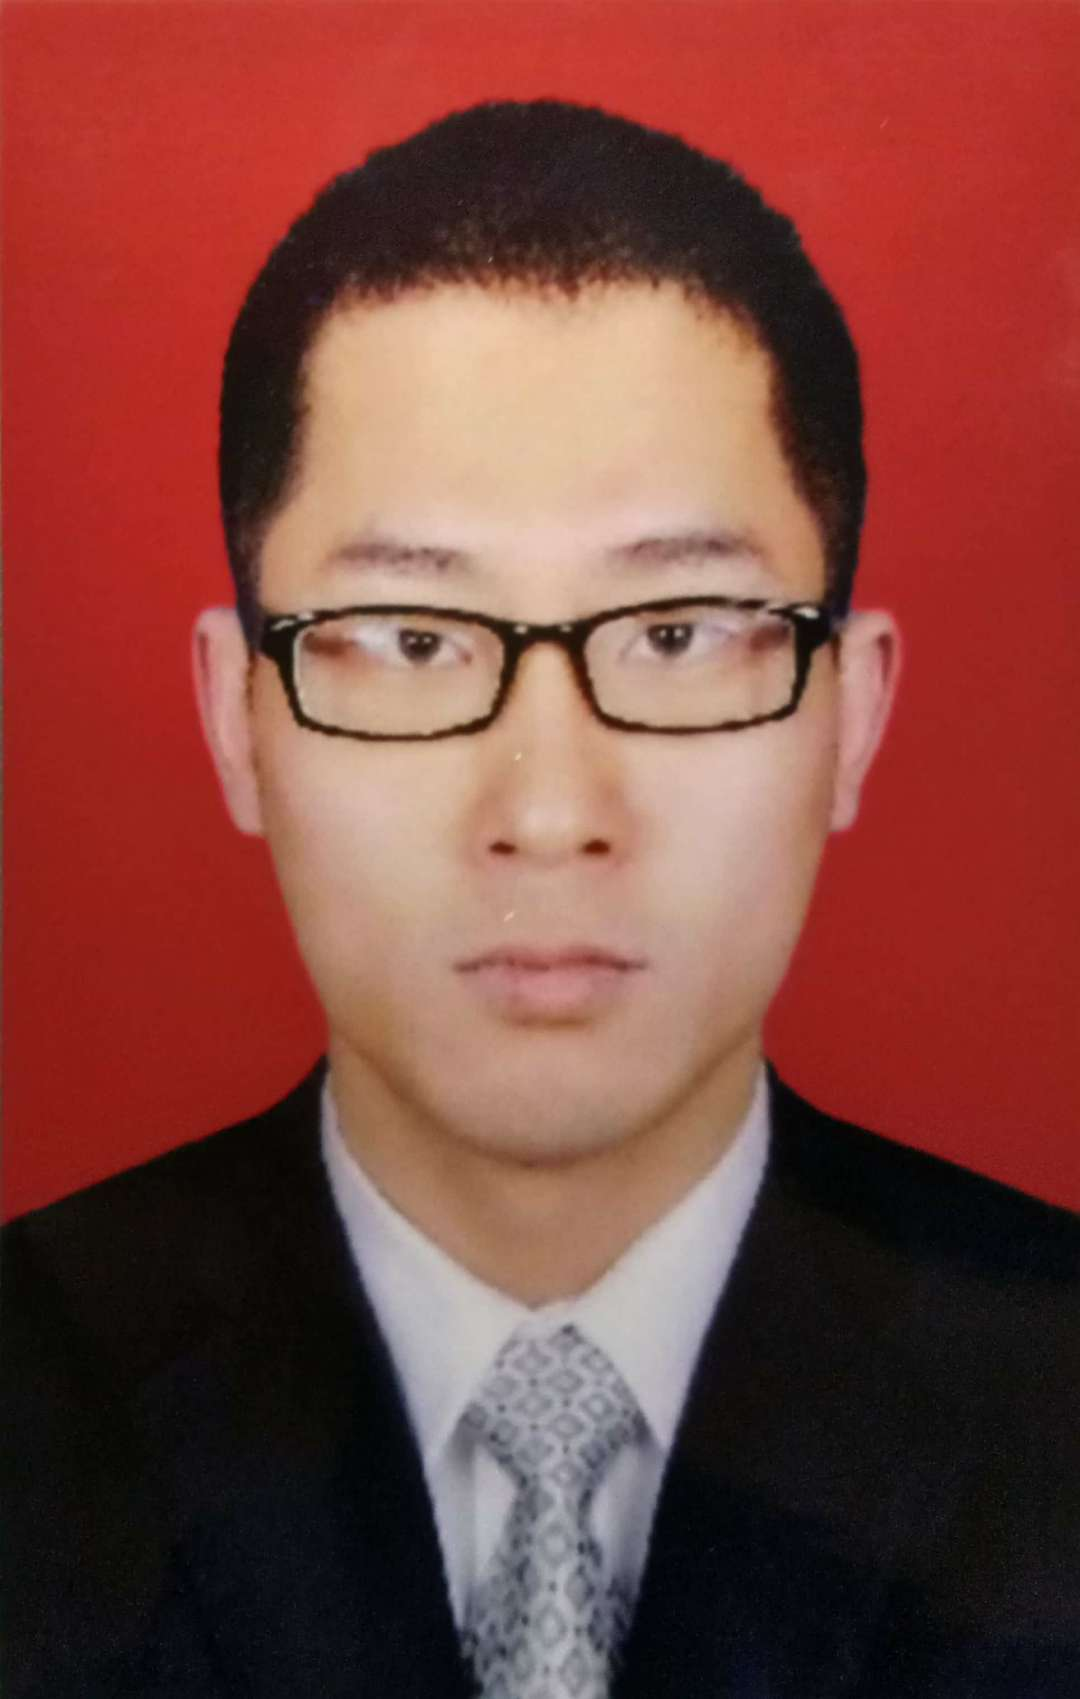 qq农牧偷匪网站_北京合同纠纷律师